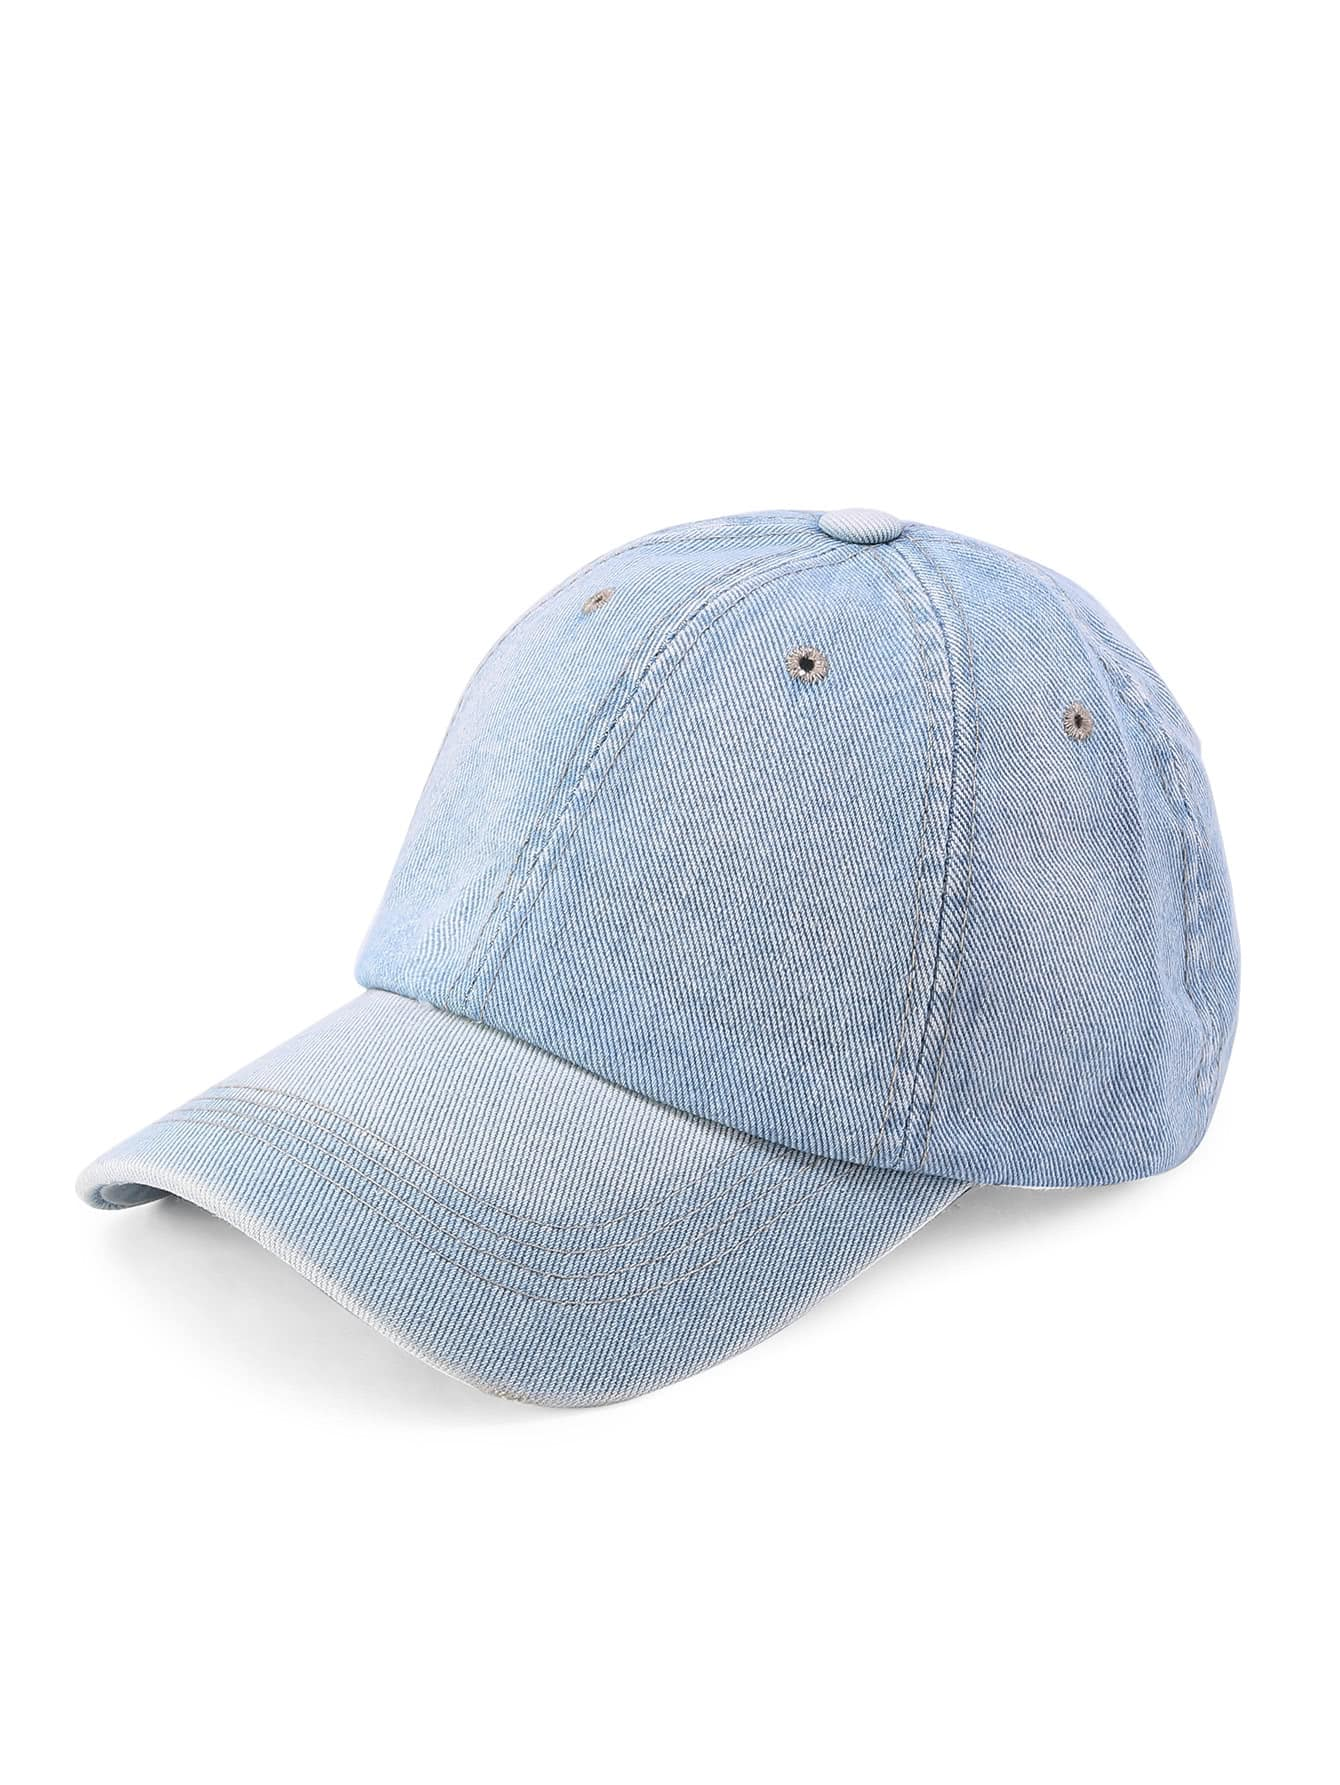 Denim Baseball Cap hat170622301